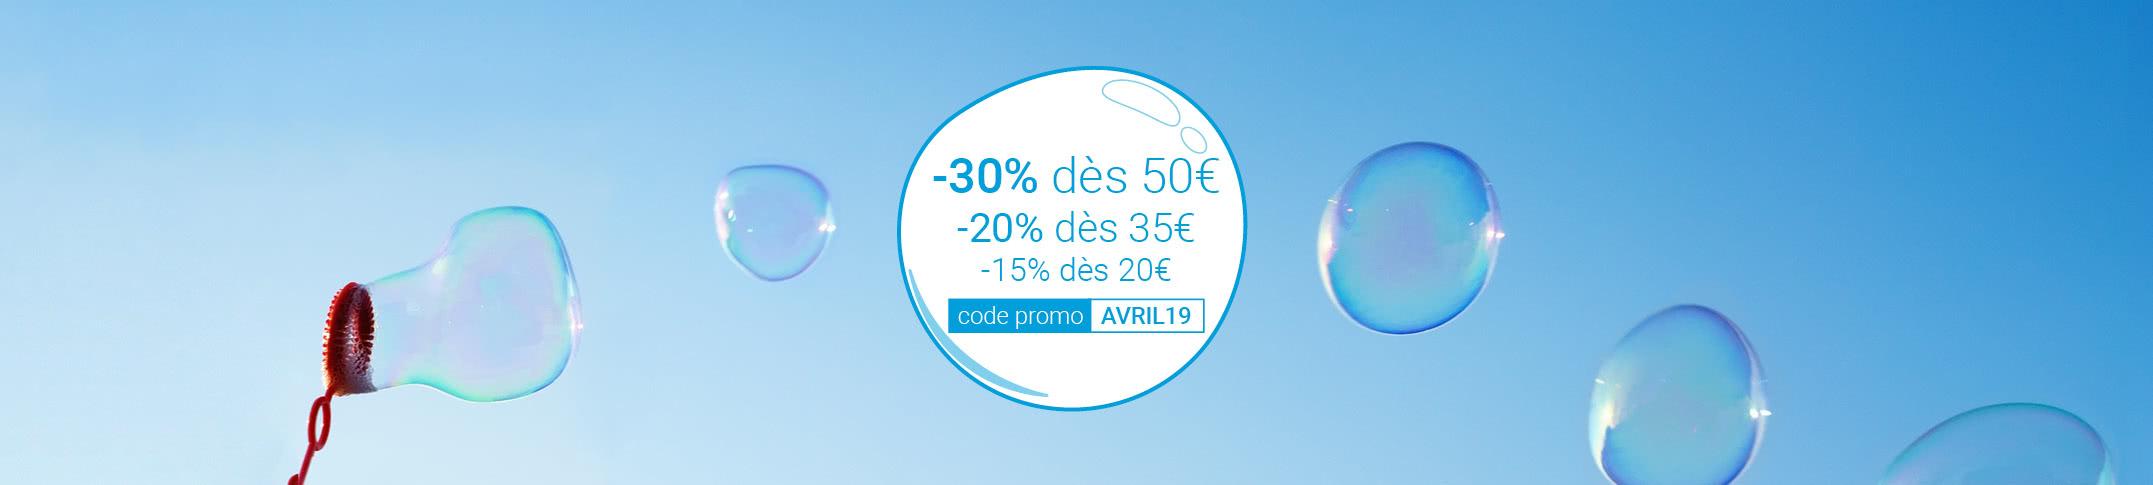 Code promo avril France smartphoto